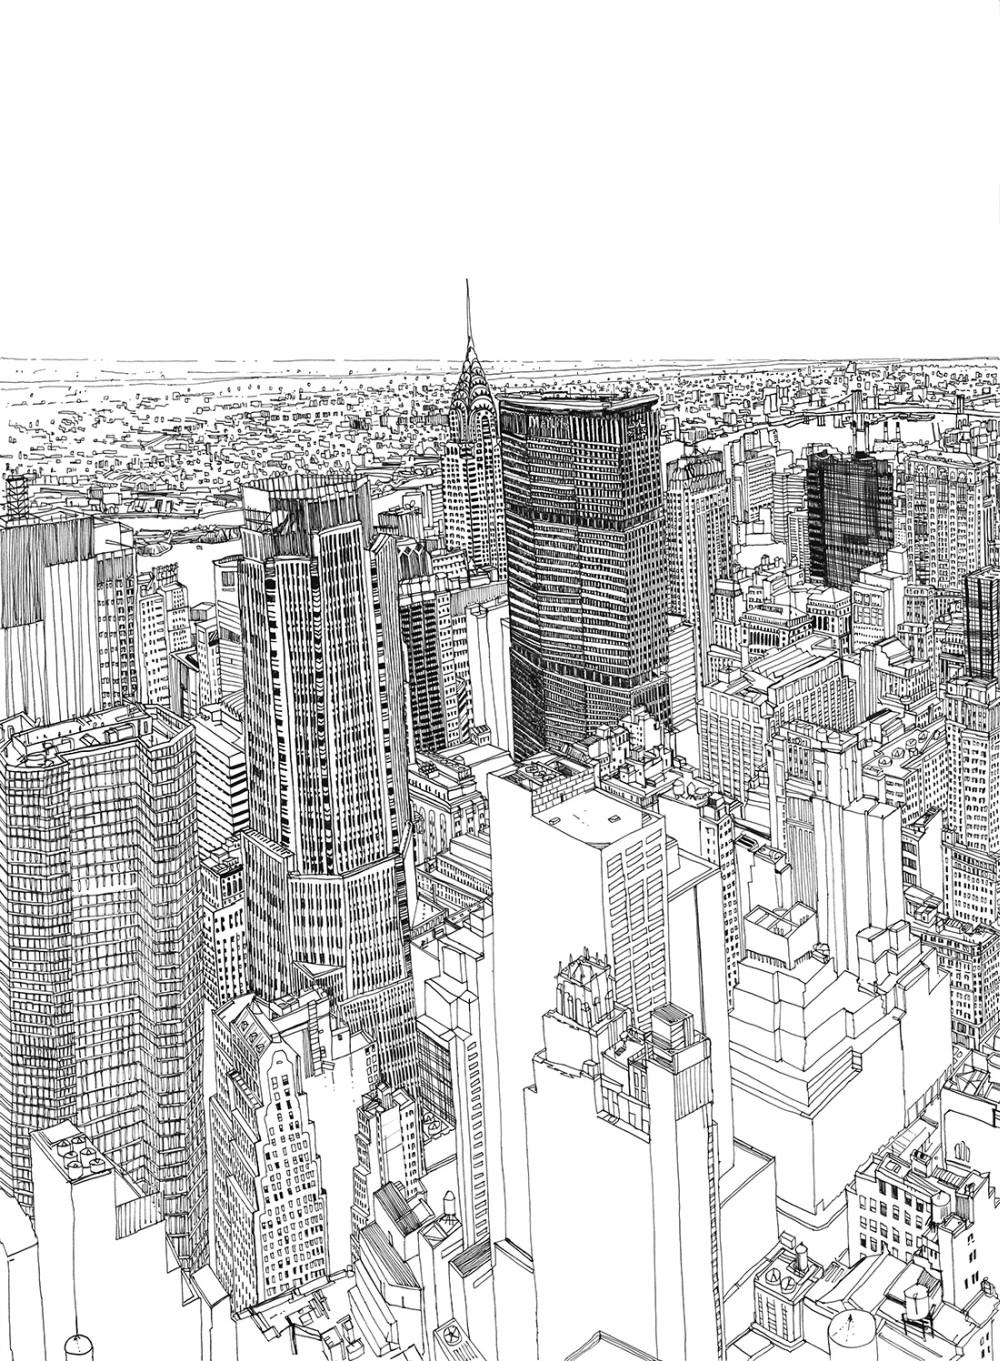 Patrick-Vale-Drawing-New-York-Skyline-123abc